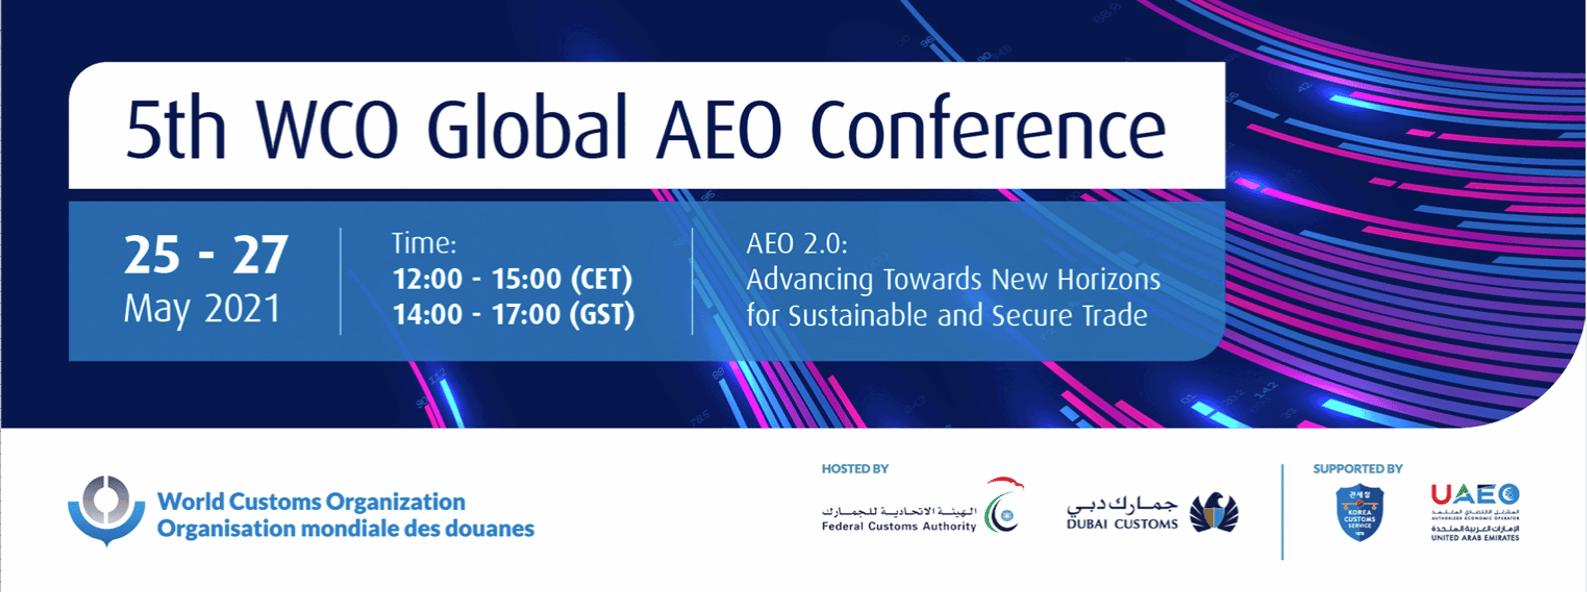 5th World Customs Organization (WCO) Global Authorized Economic Operator (AEO) Conference